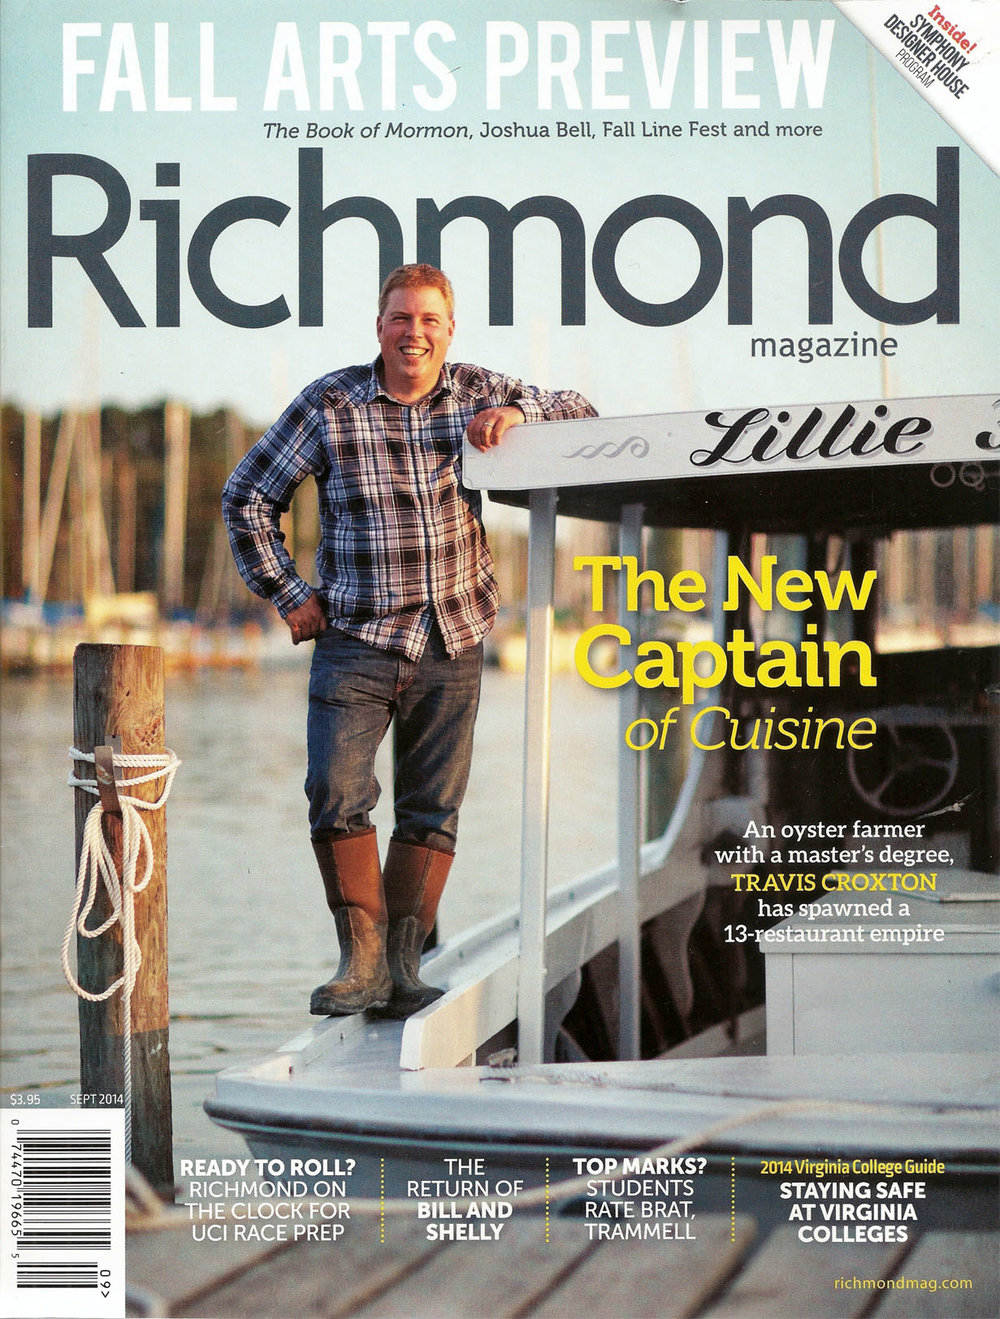 RichmondMag_Sept2014_cover.jpg